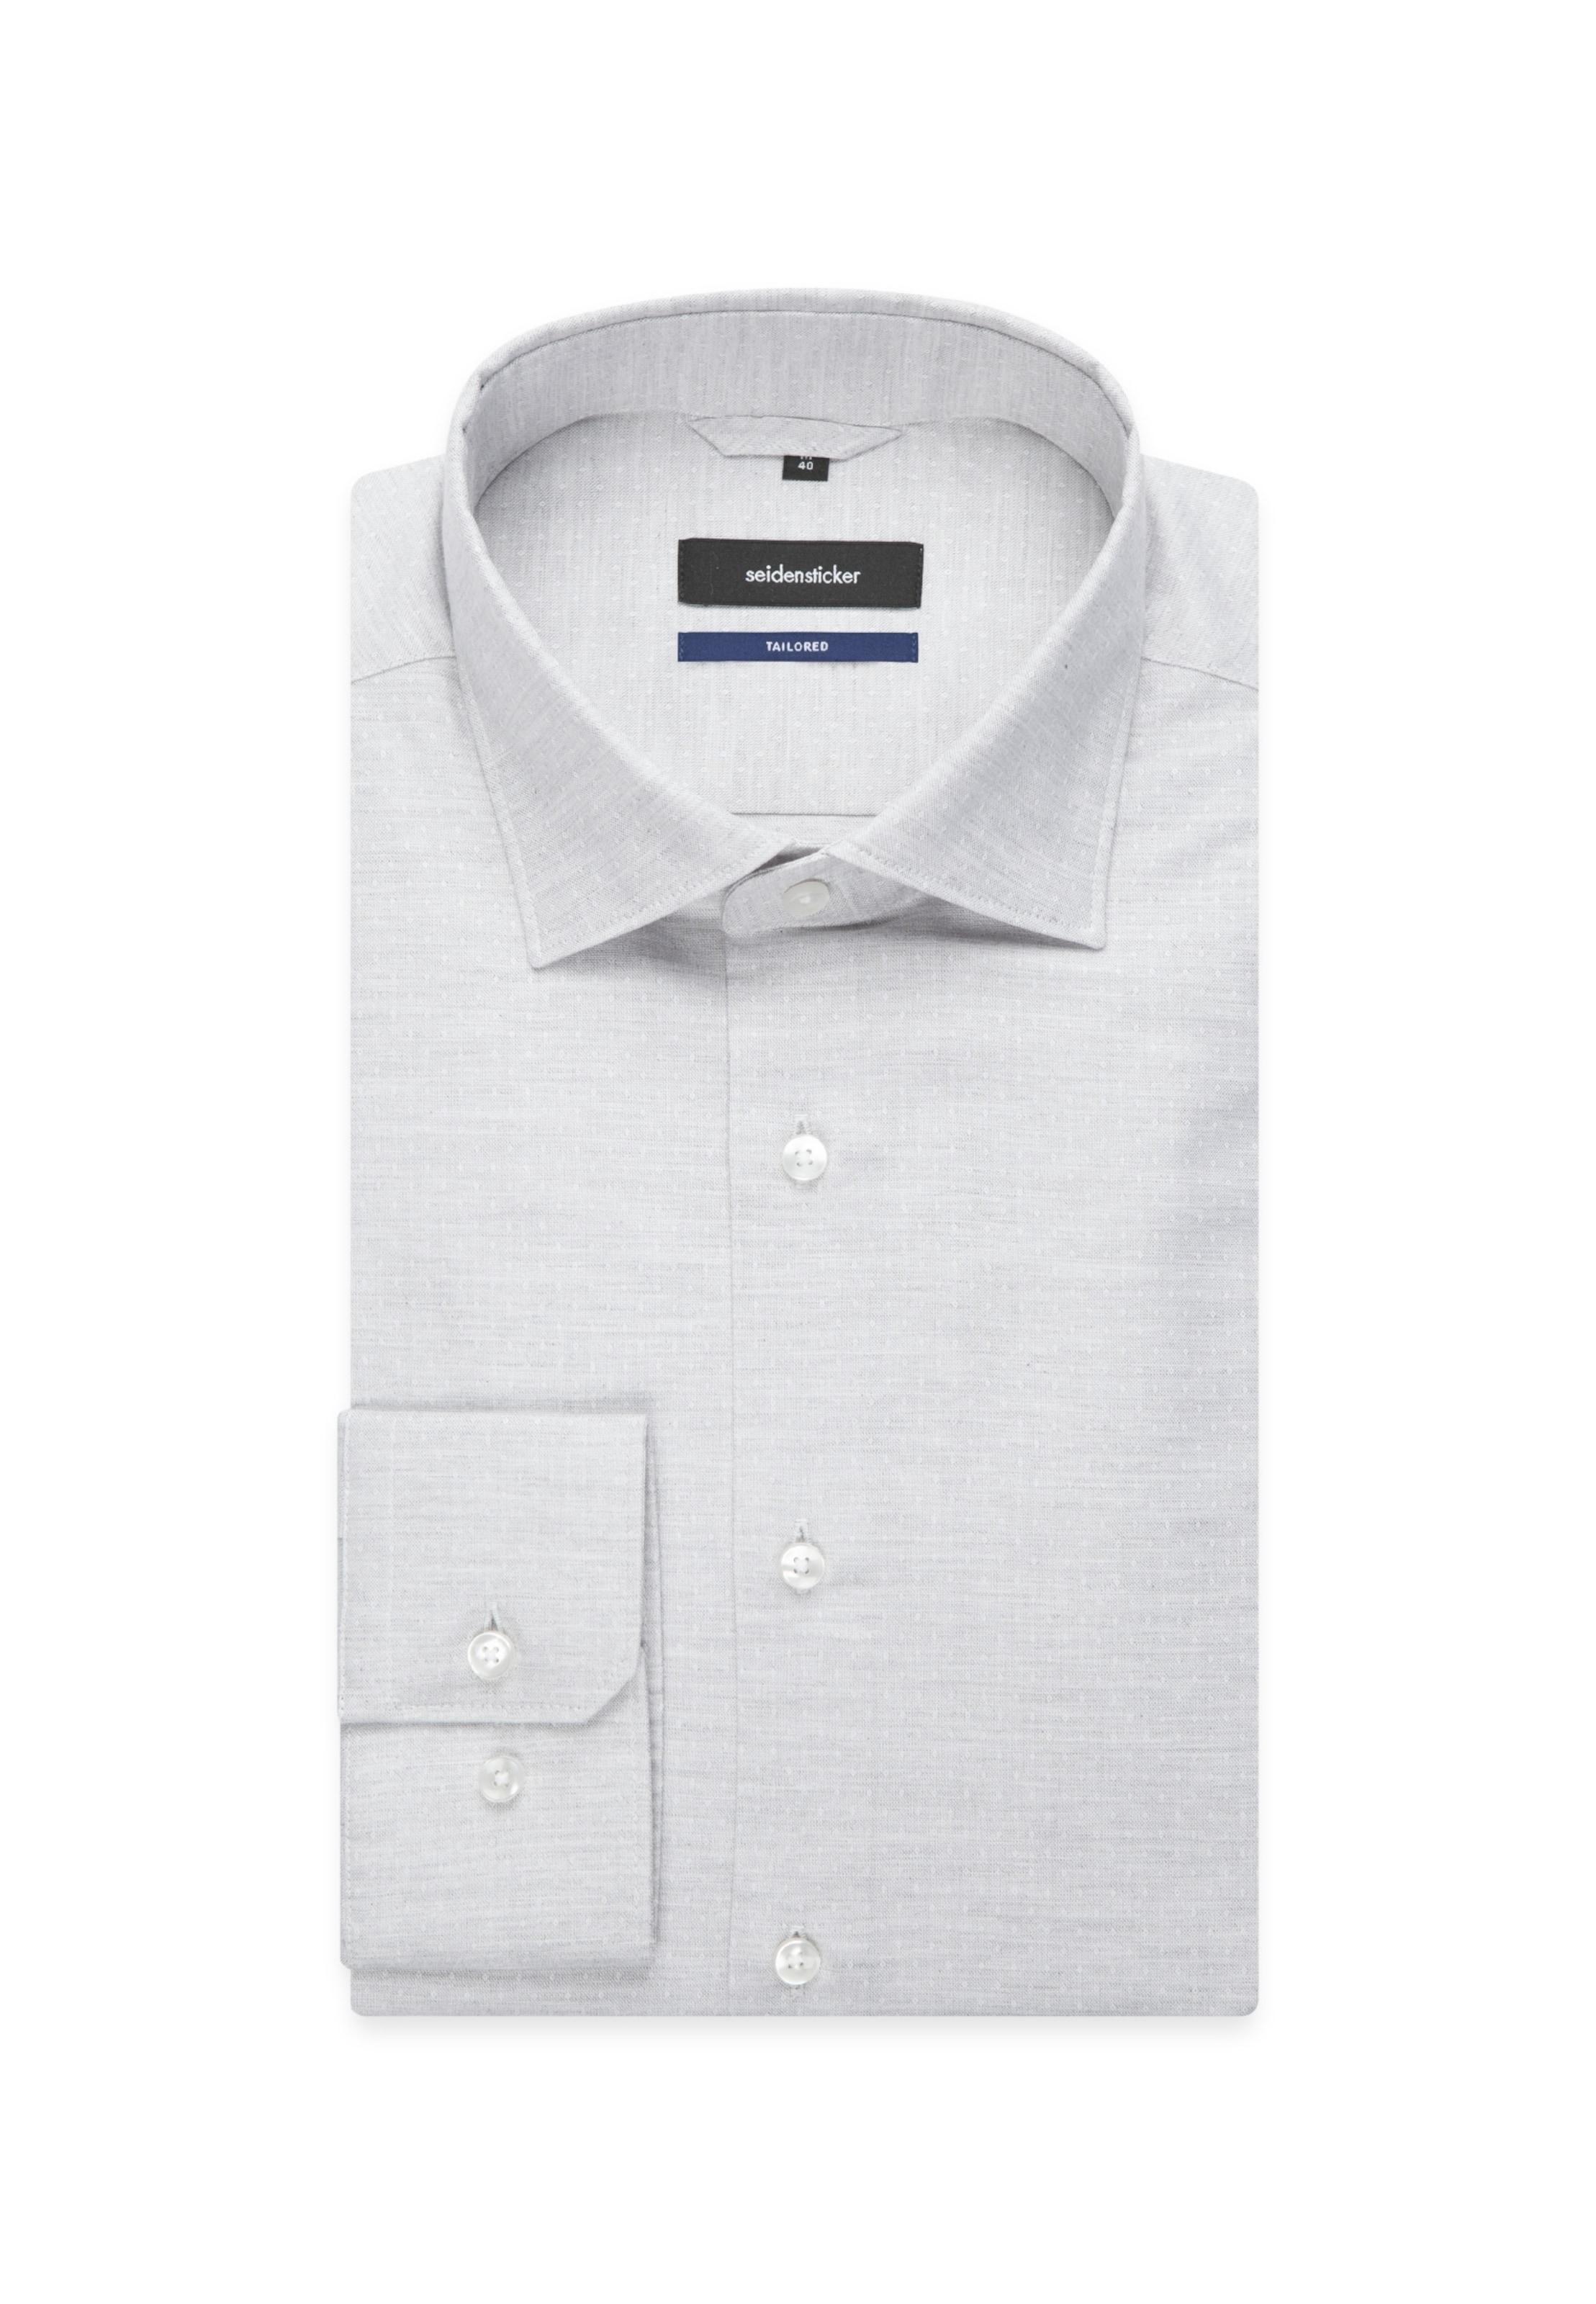 Seidensticker Seidensticker Hemd Hemd In Graumeliert q354RjLA